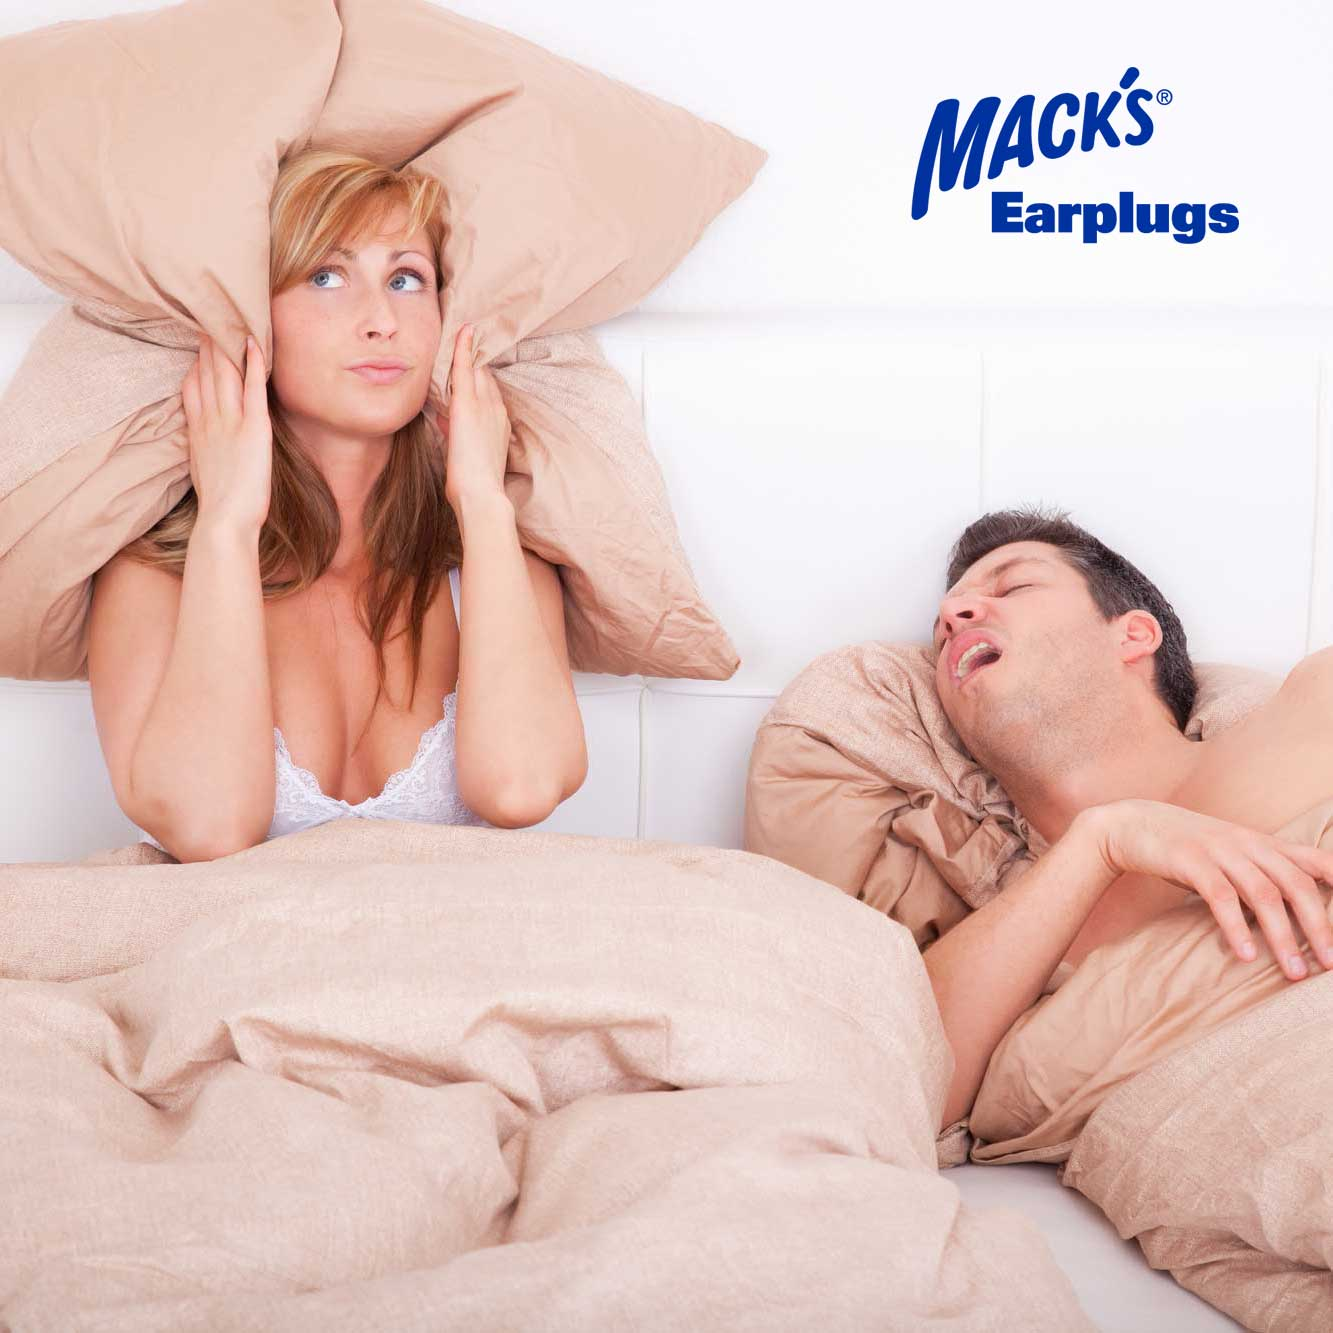 Snoring-Ear-Plugs-spuntydousi.cz